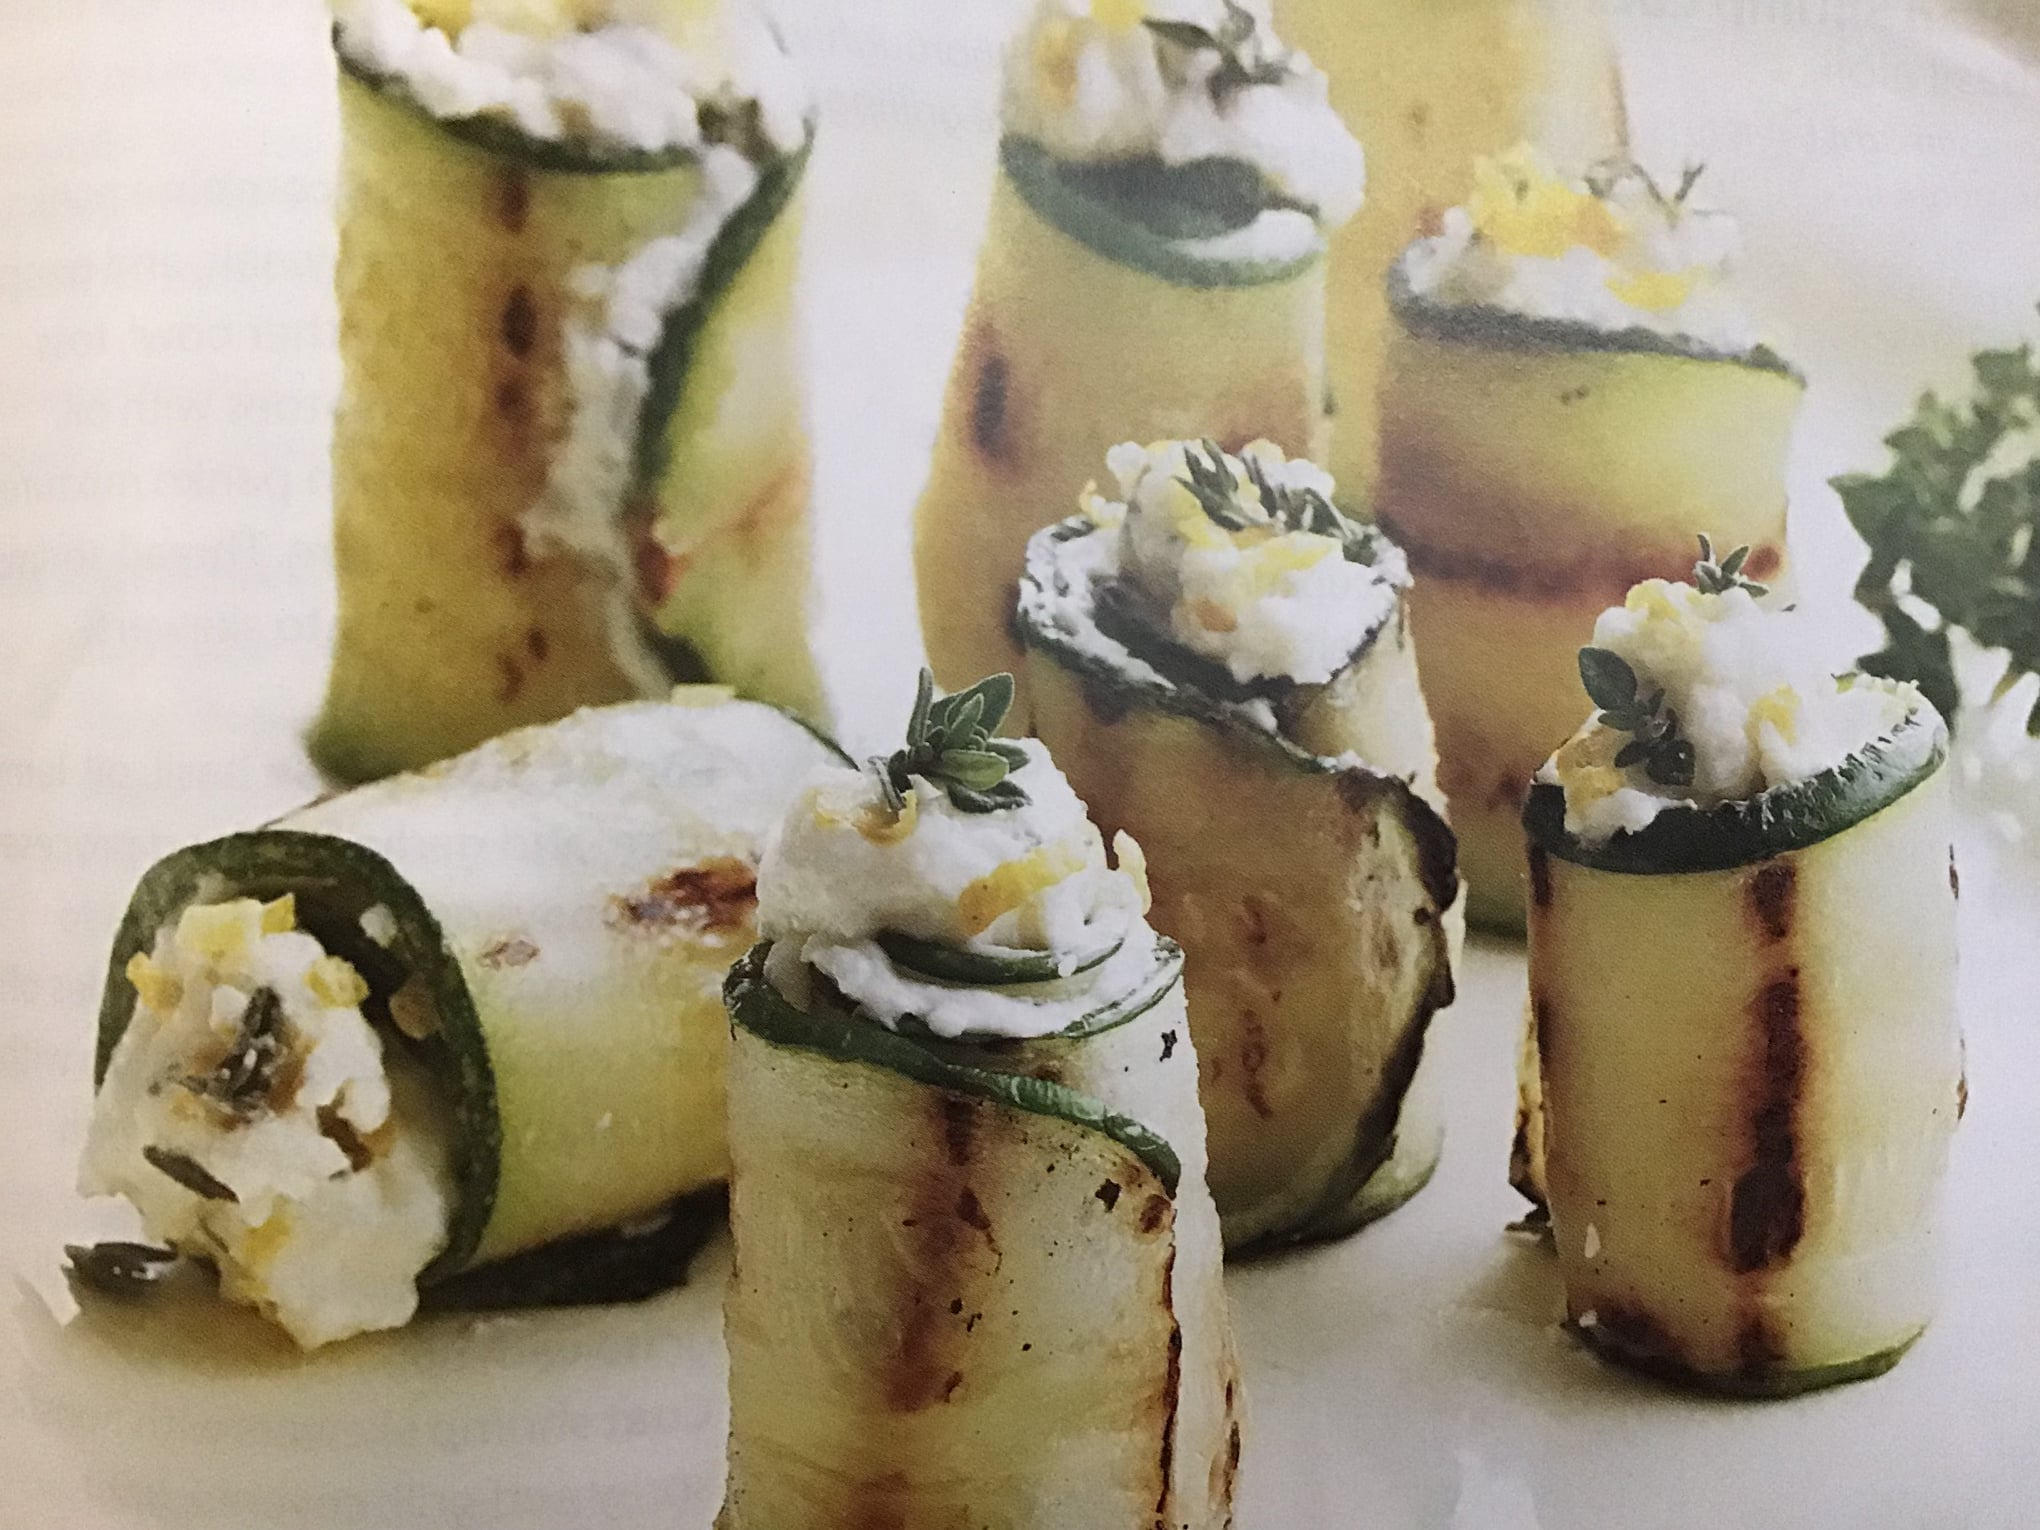 Unique Grilled Zucchini Roll-Ups